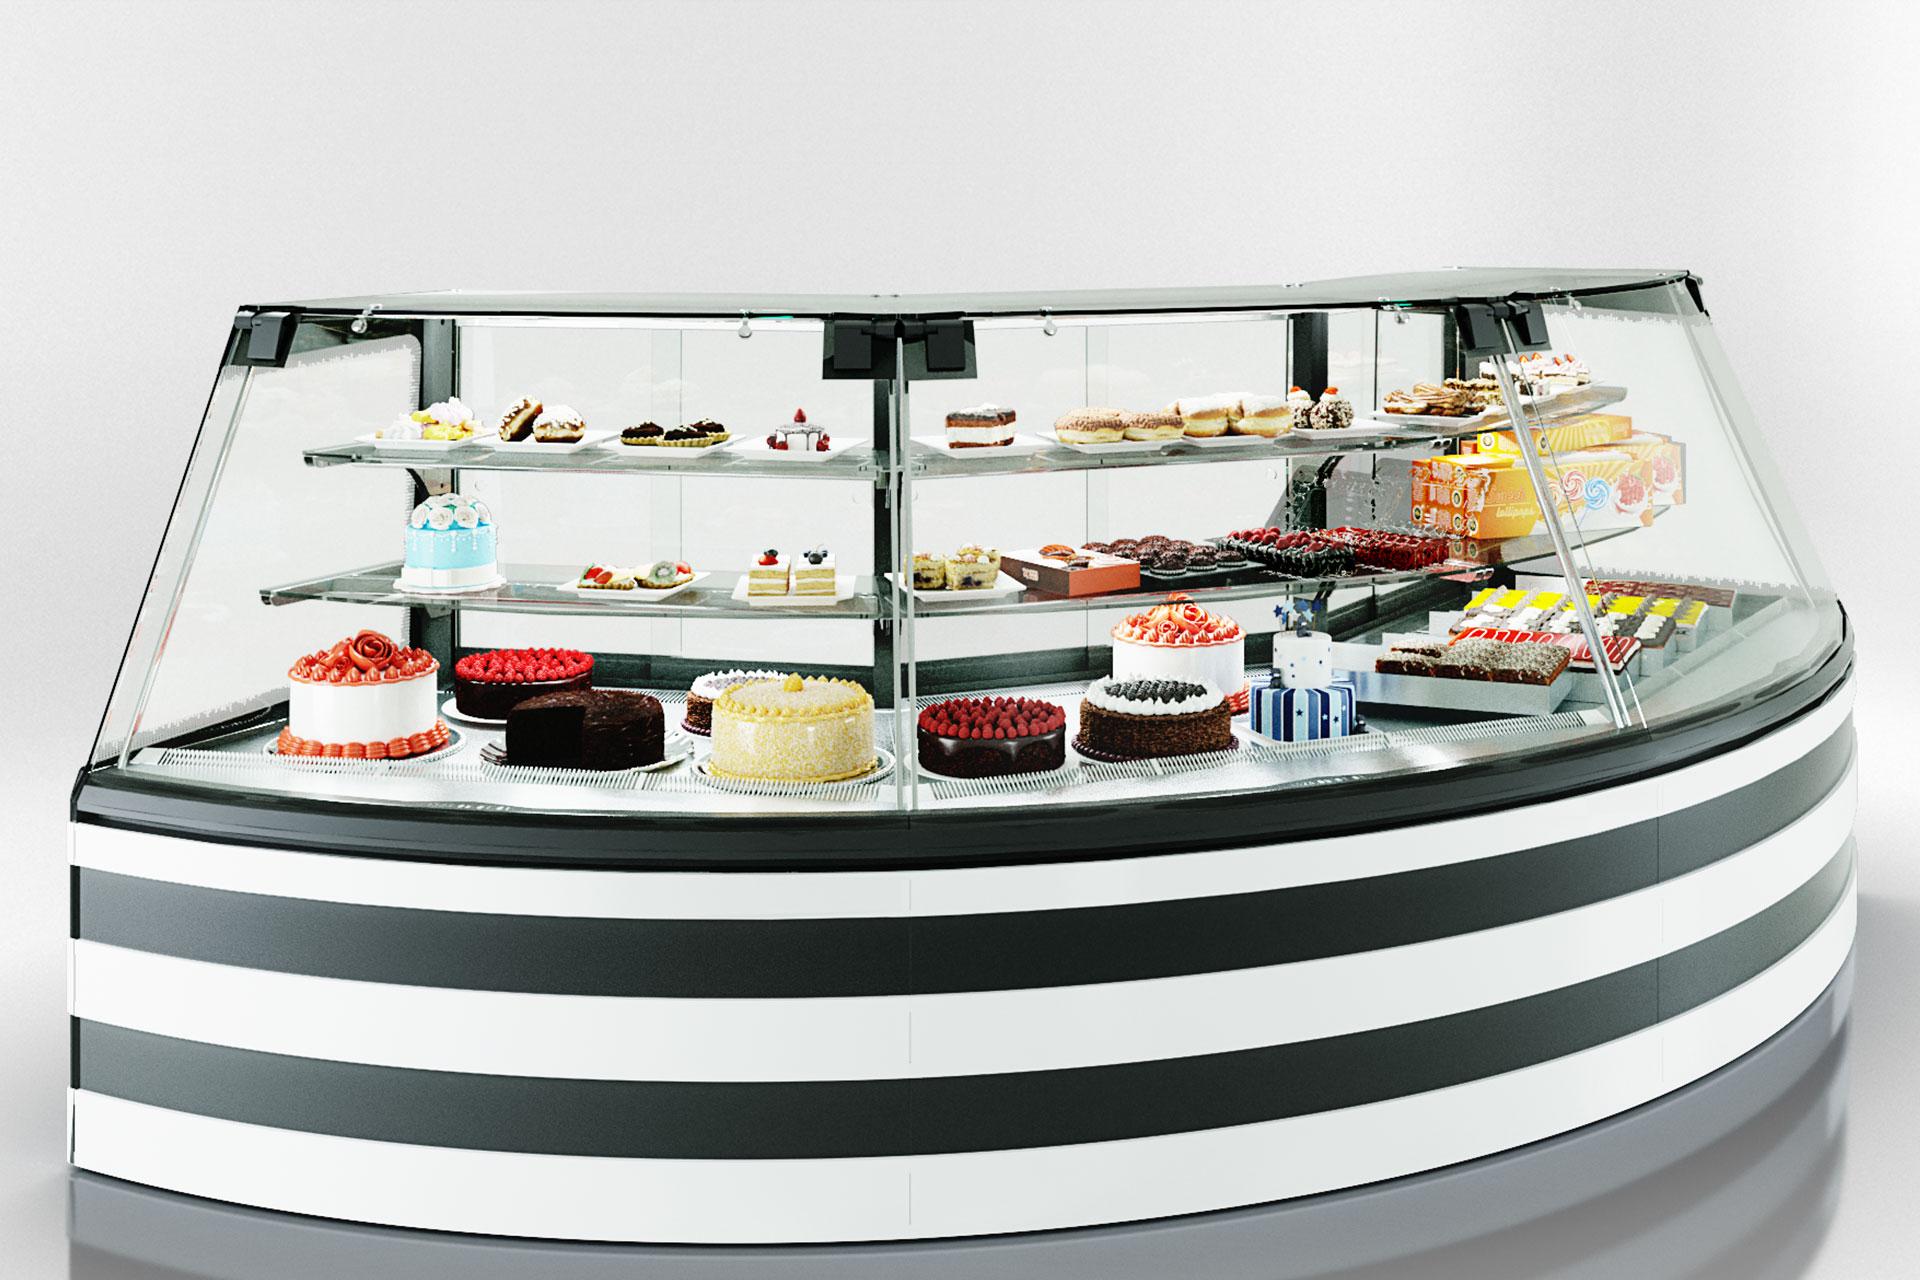 Confectionery counters Dakota Sapphire KA 090 patisserie PS 140-DLA-ER35